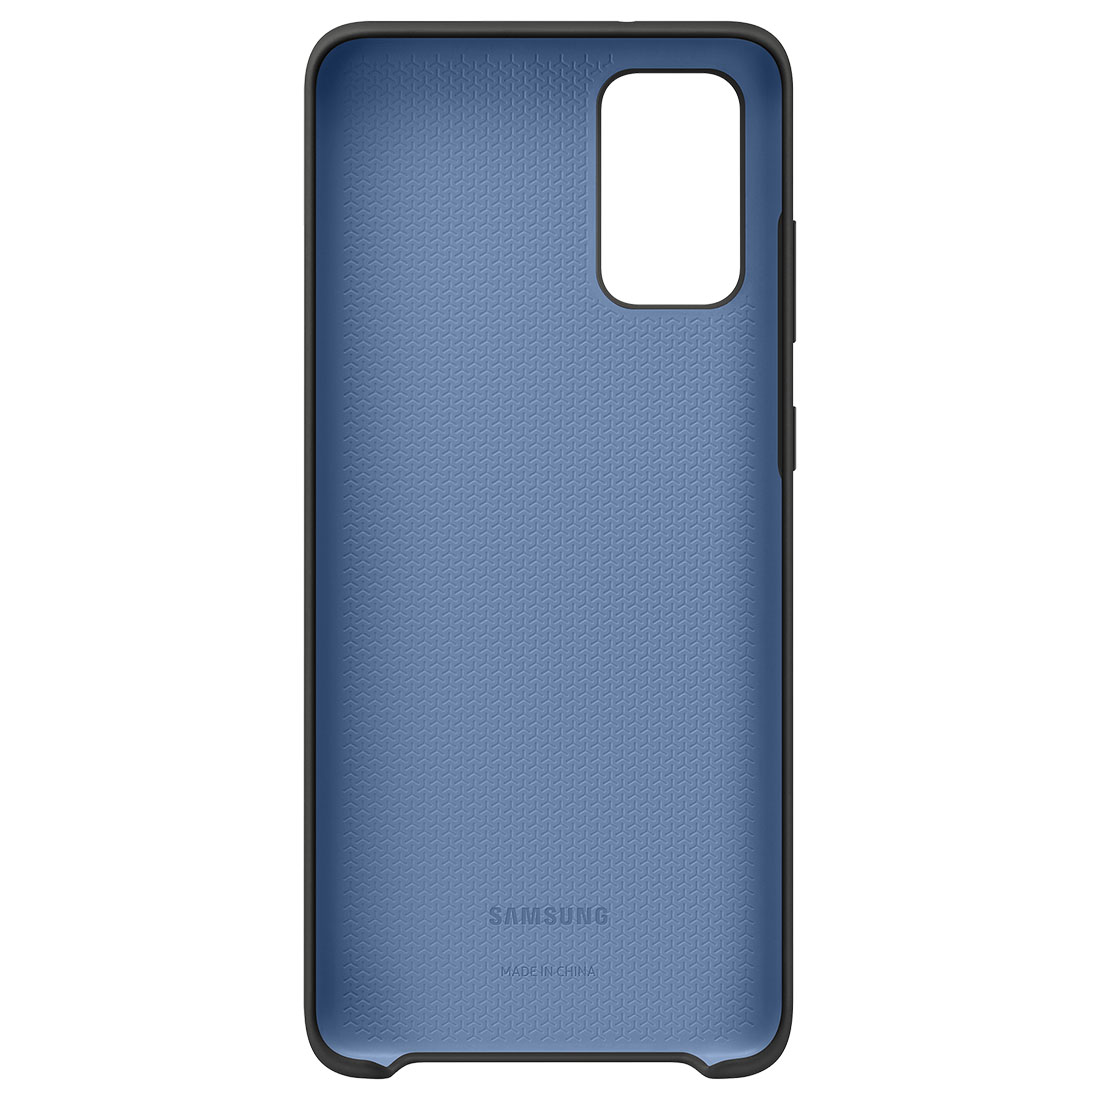 Capa Original Samsung Silicone Cover Galaxy S20 Plus 6.7 Pol G985